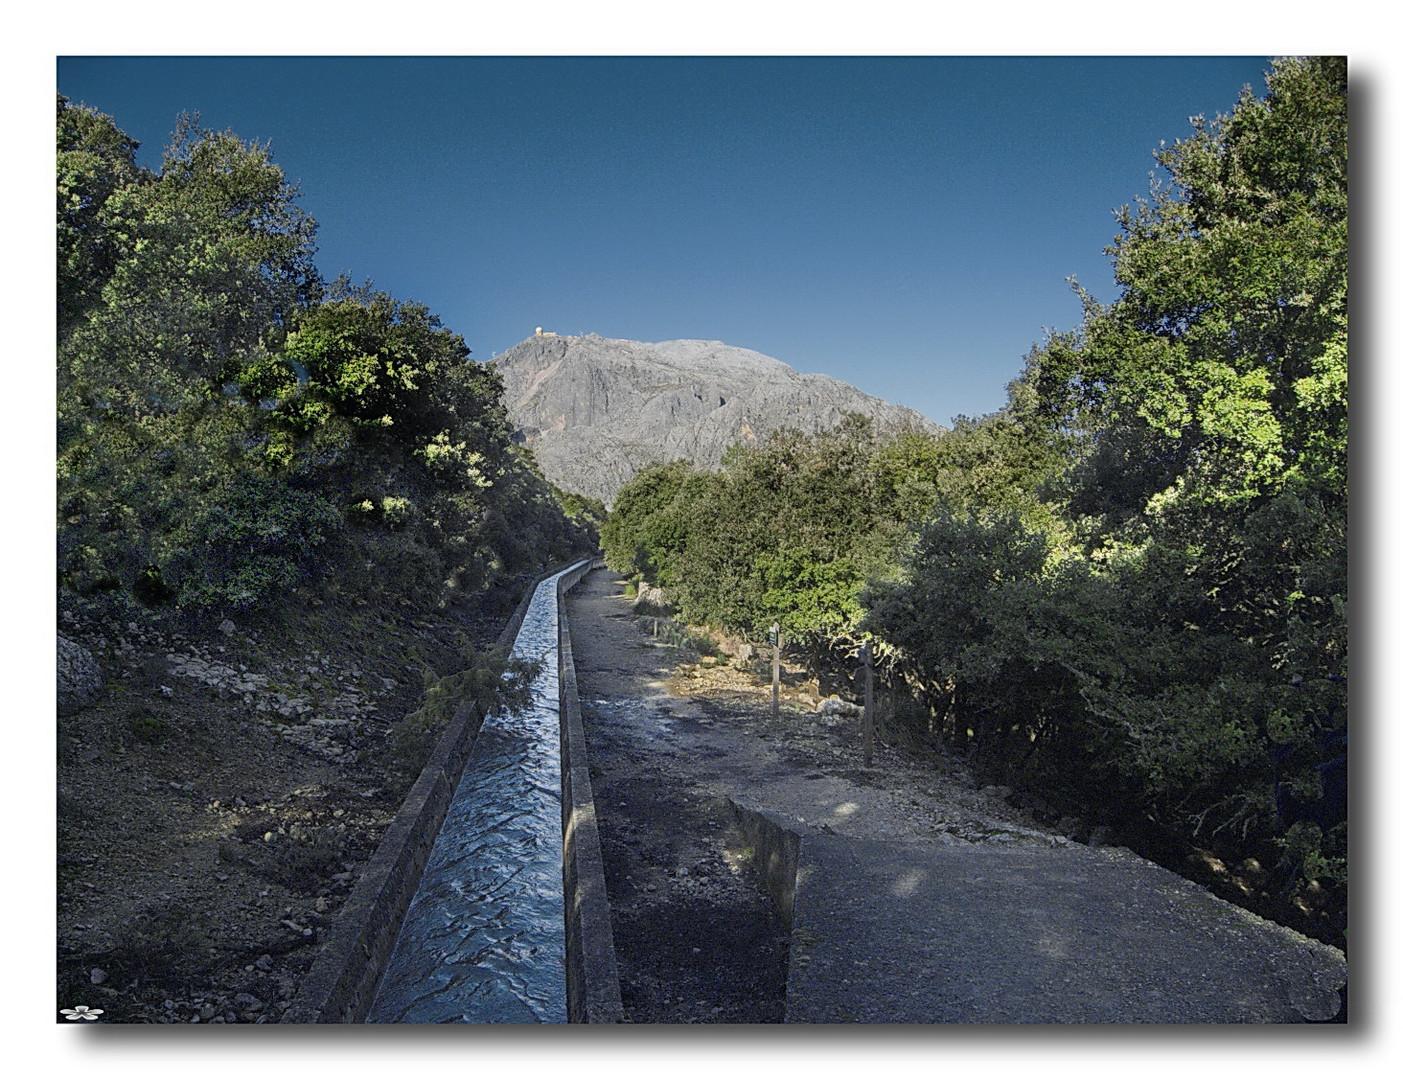 Sa canaleta -Puig Major